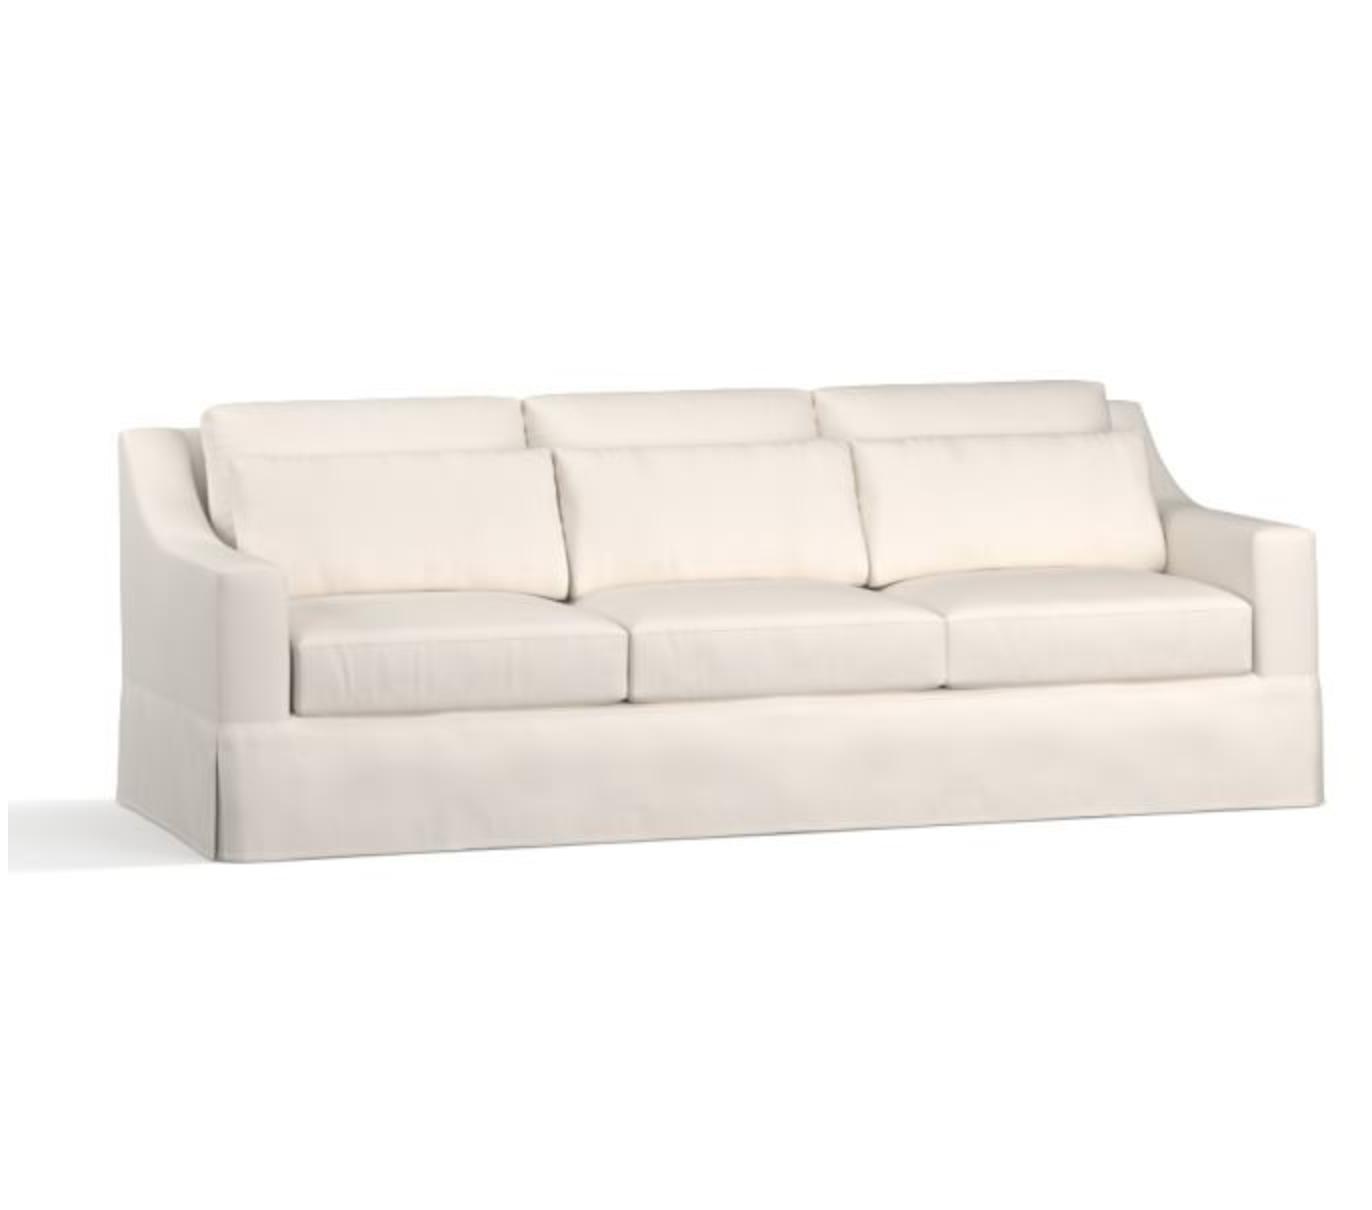 Slipcovered Sofa.png